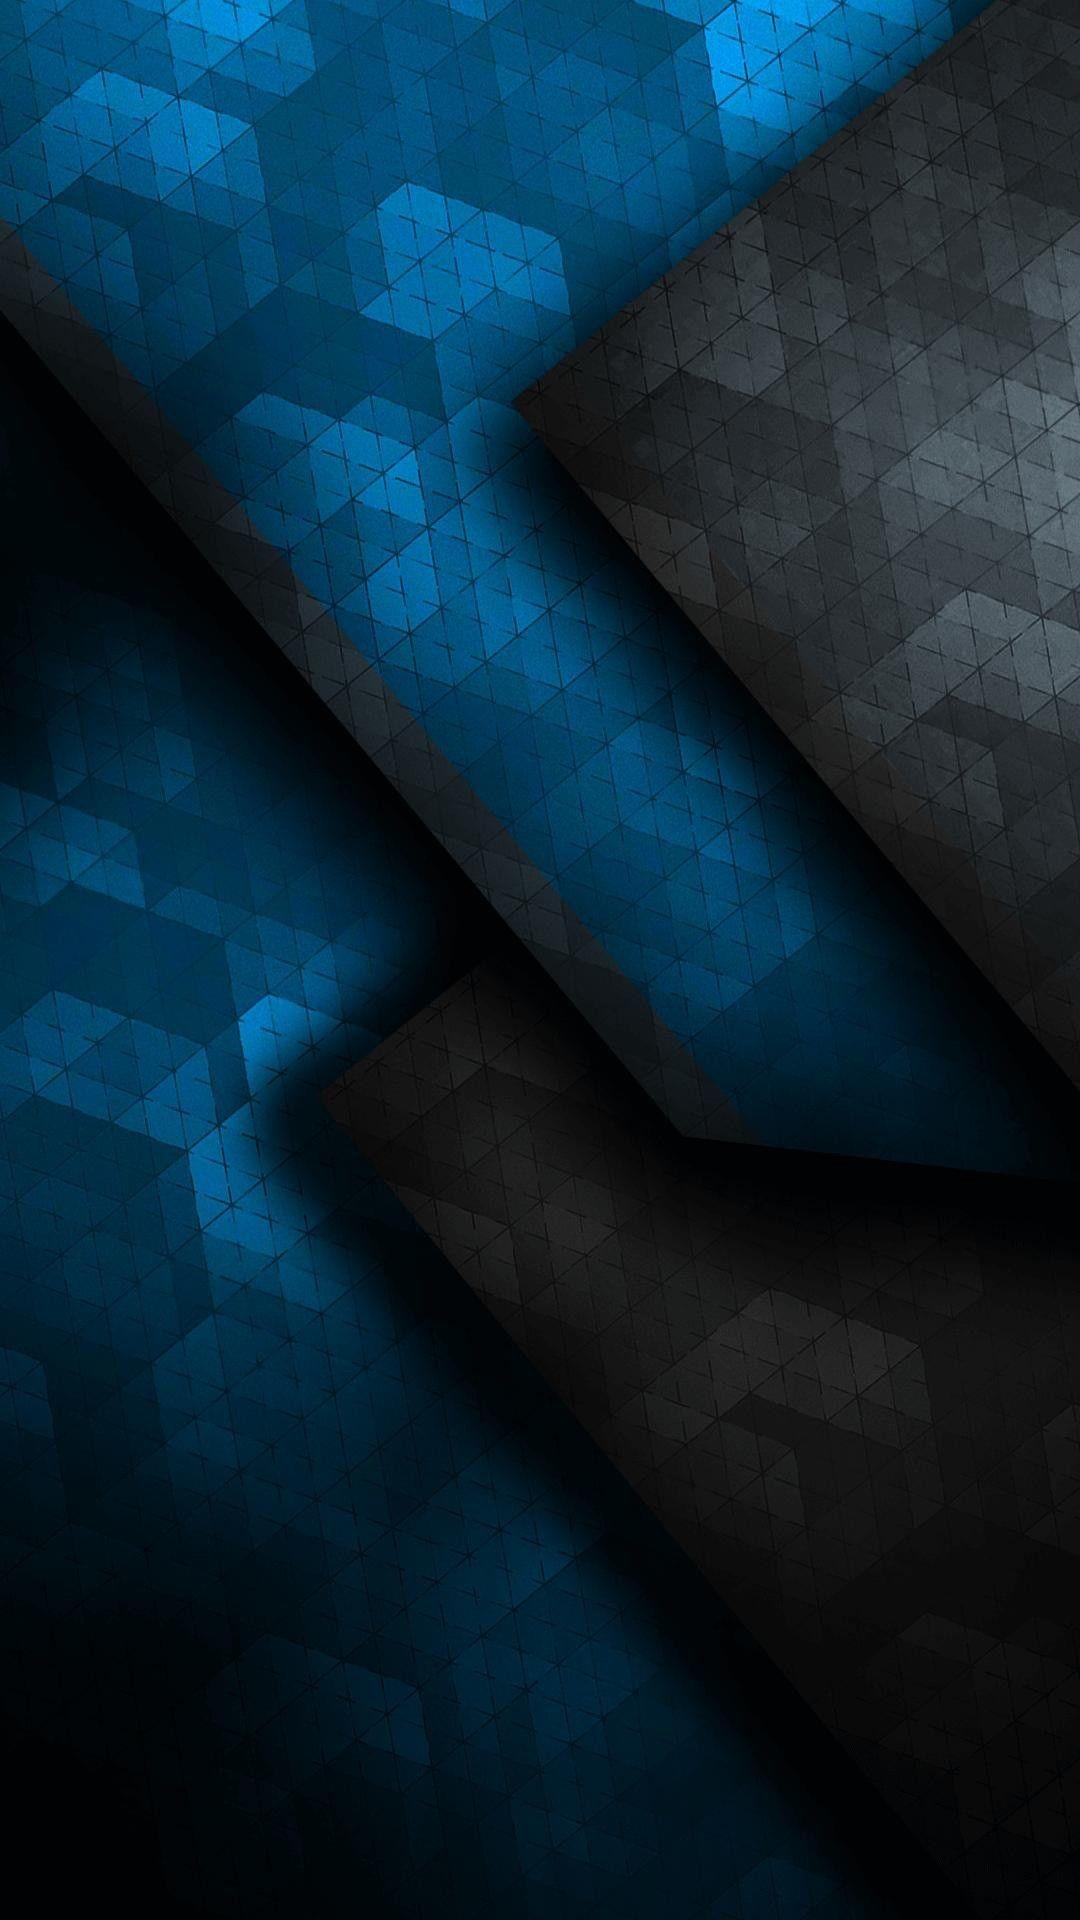 Blue Cool Black Full Hd Wallpaper Beautiful Melhor Abstract Wallpaper Smartphone 167394 Hd Wallpaper Backgrounds Download